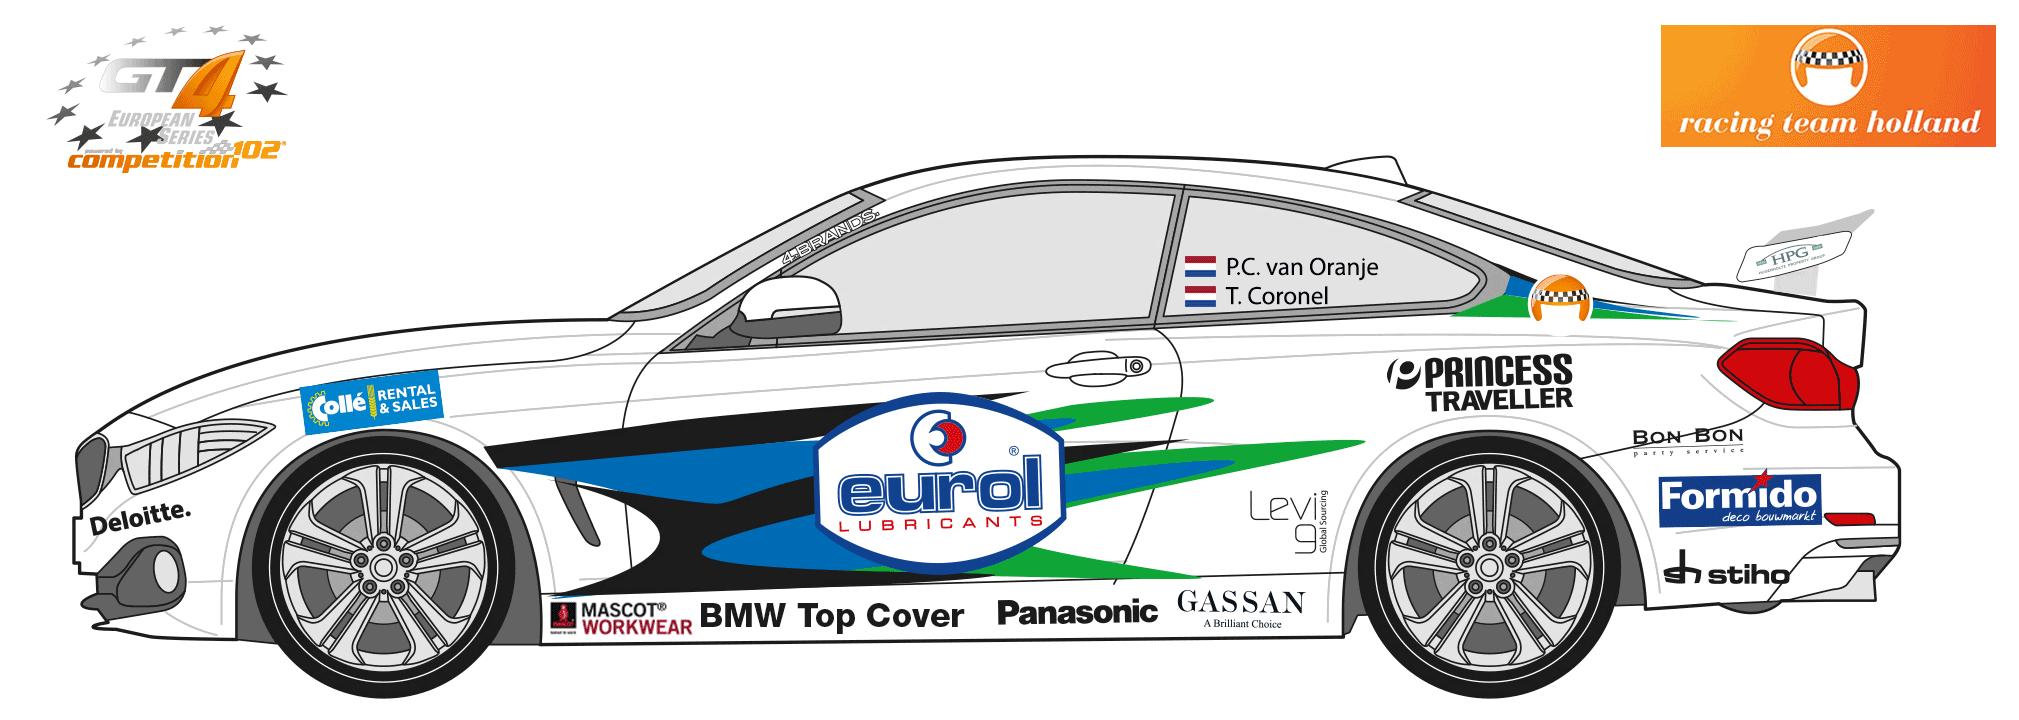 Tim Coronel goes Royal in GT4 series!